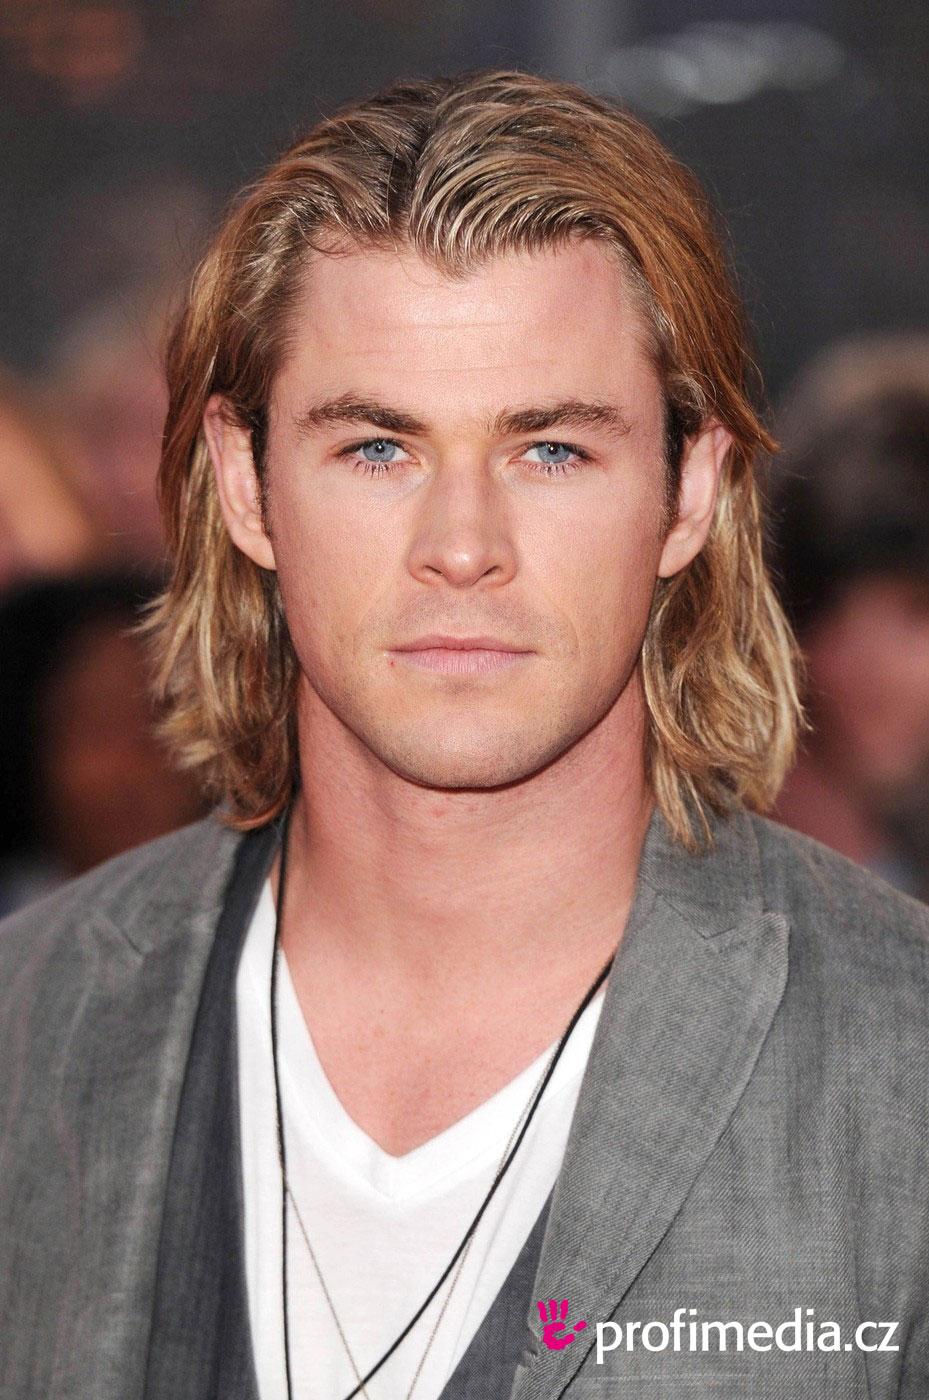 Chris Hemsworth Frisyr Easyhairstyler